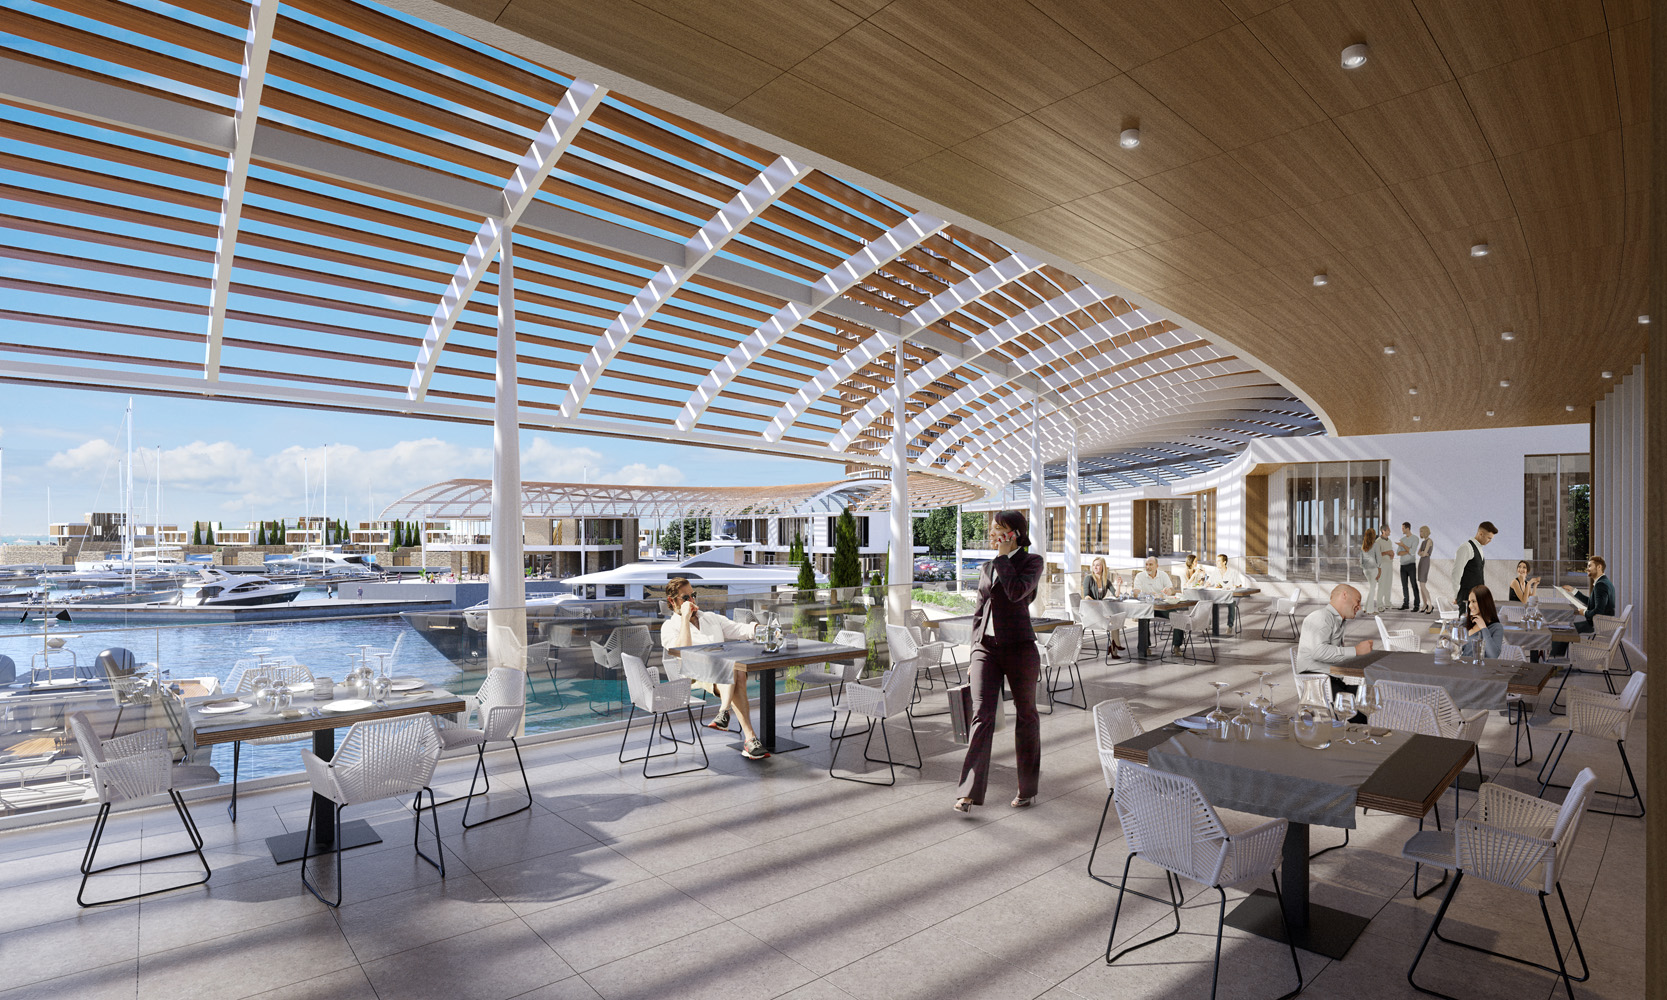 Ayia Napa Marina Pyare Village Parasol Top Floor Restaurant